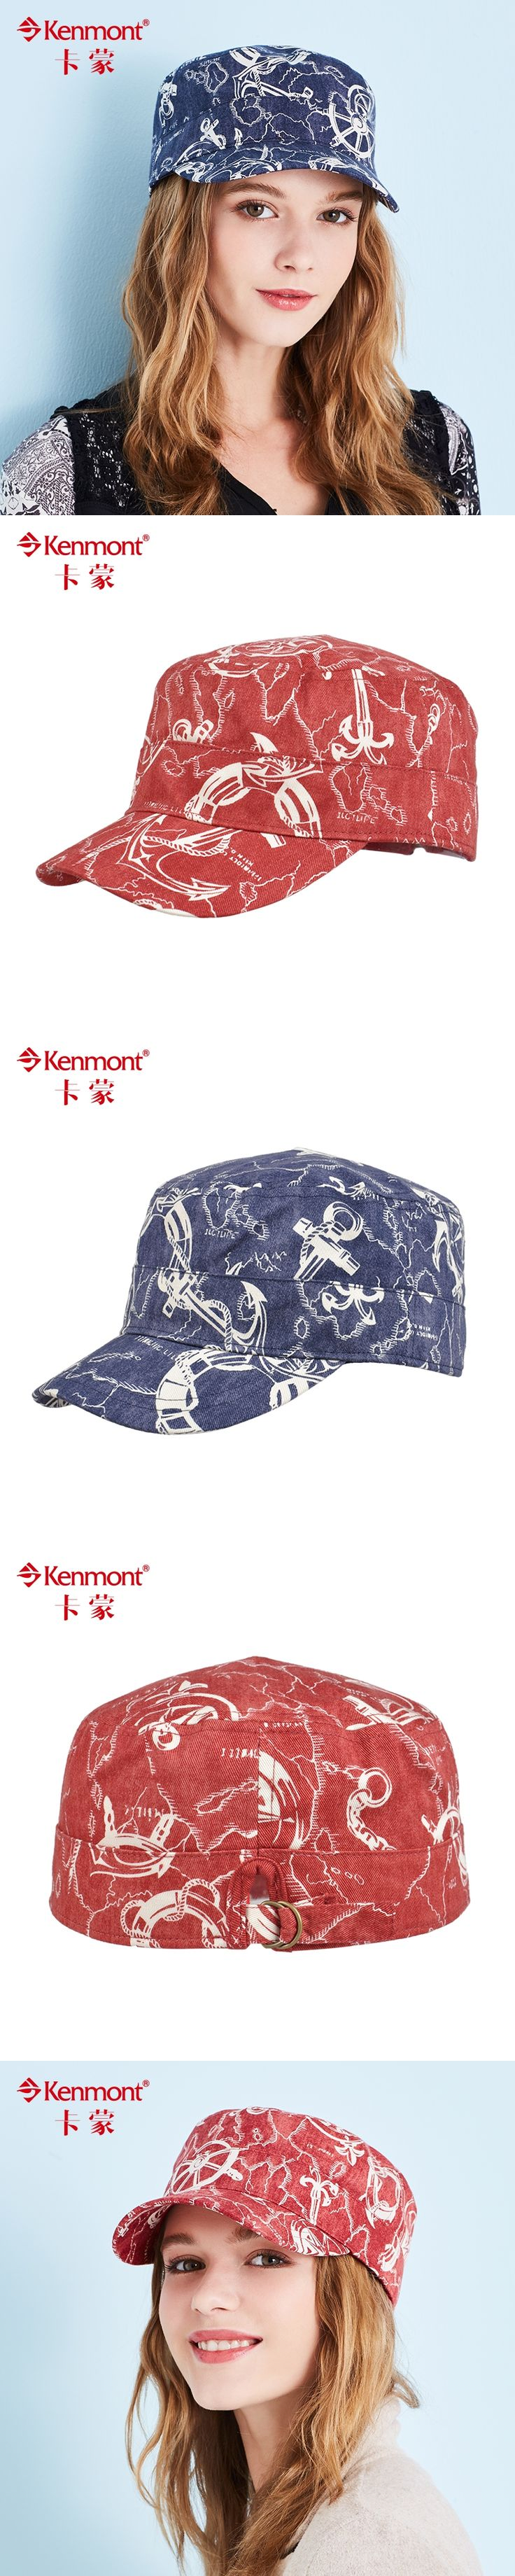 Kenmont summer sunshade hat flatcap male cotton fashion tourism cap repair face female peaked cap